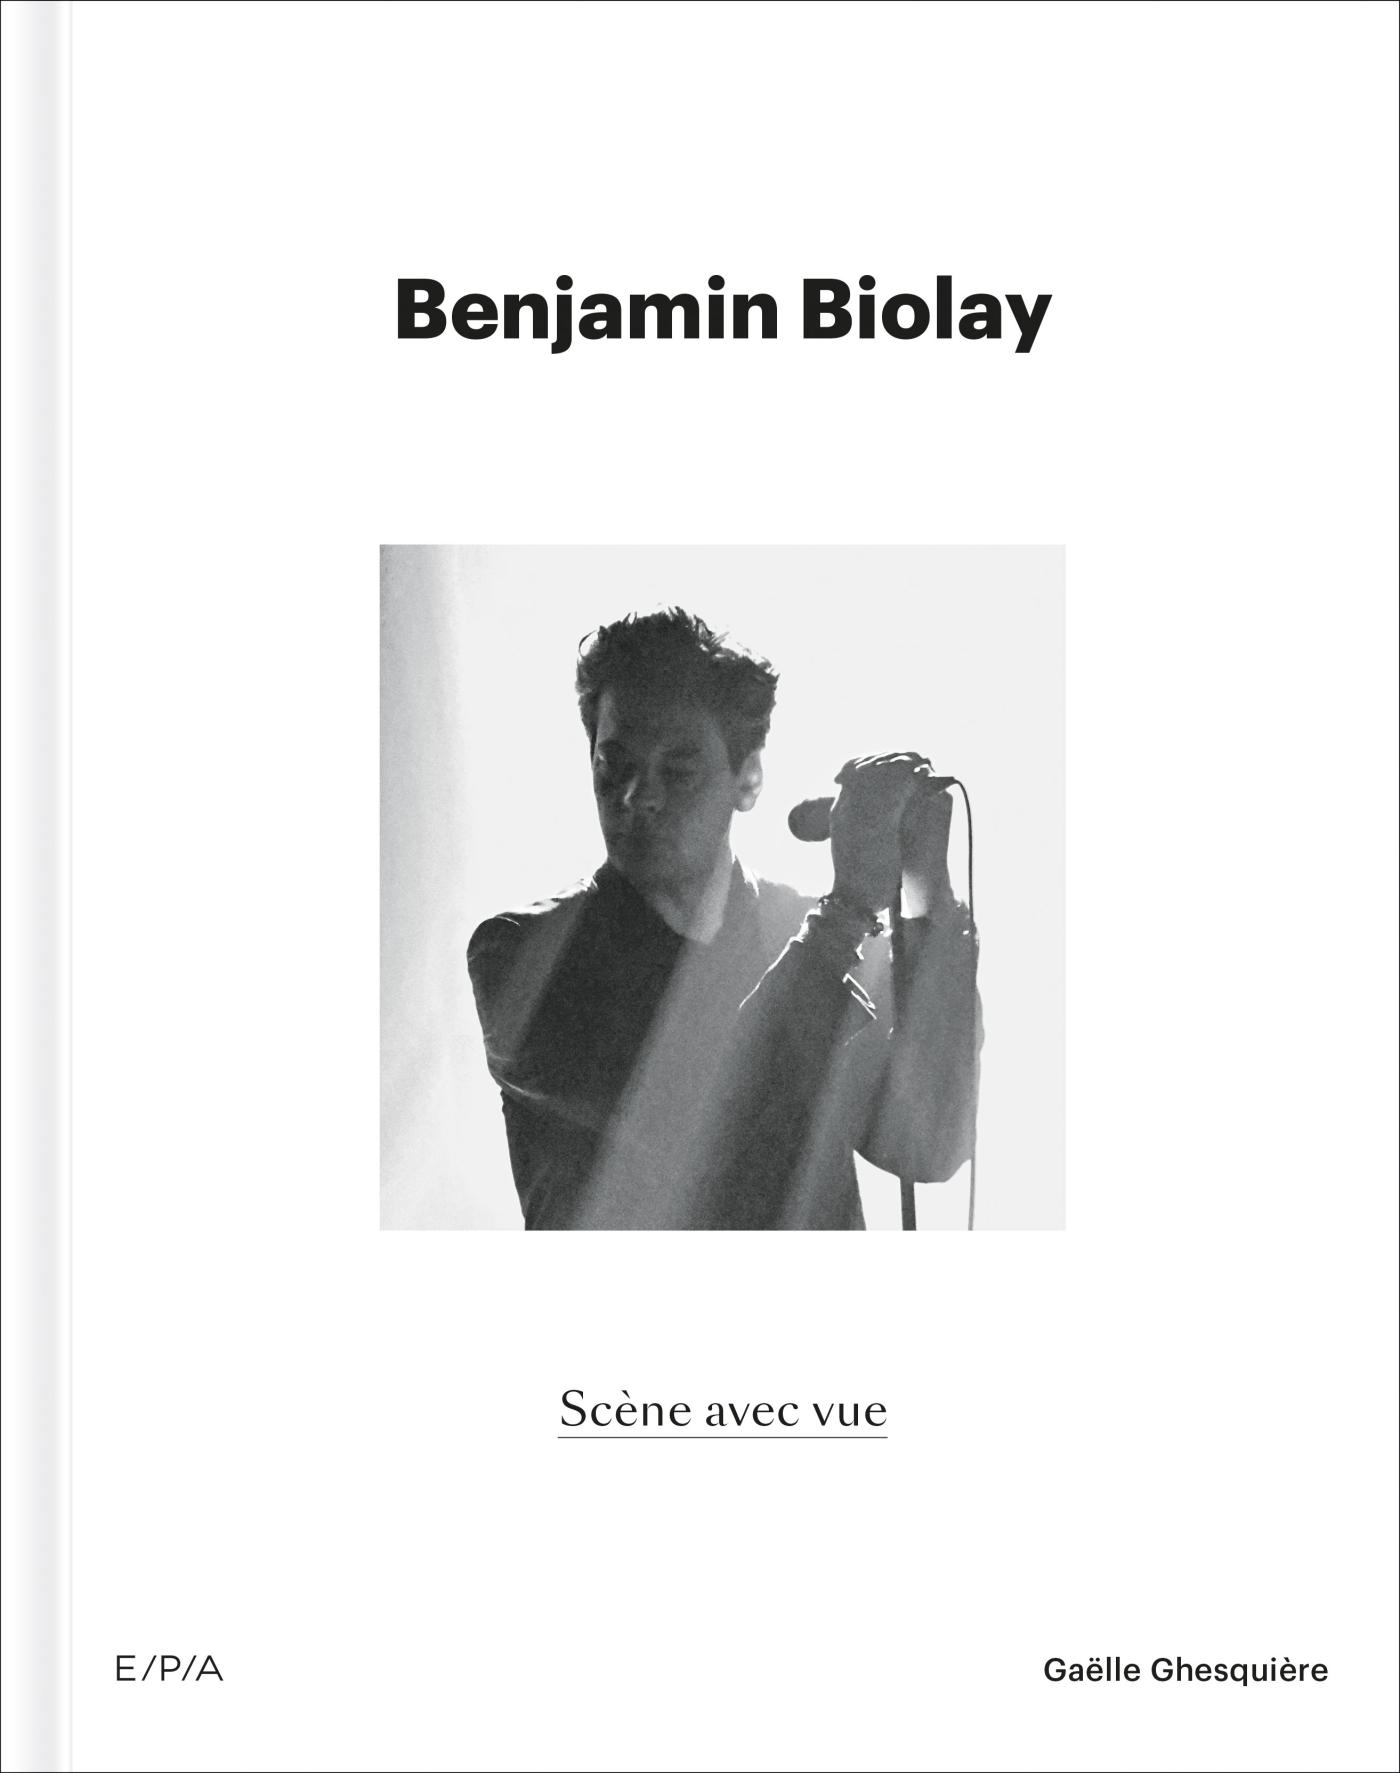 BENJAMIN BIOLAY, SCENE AVEC VUE